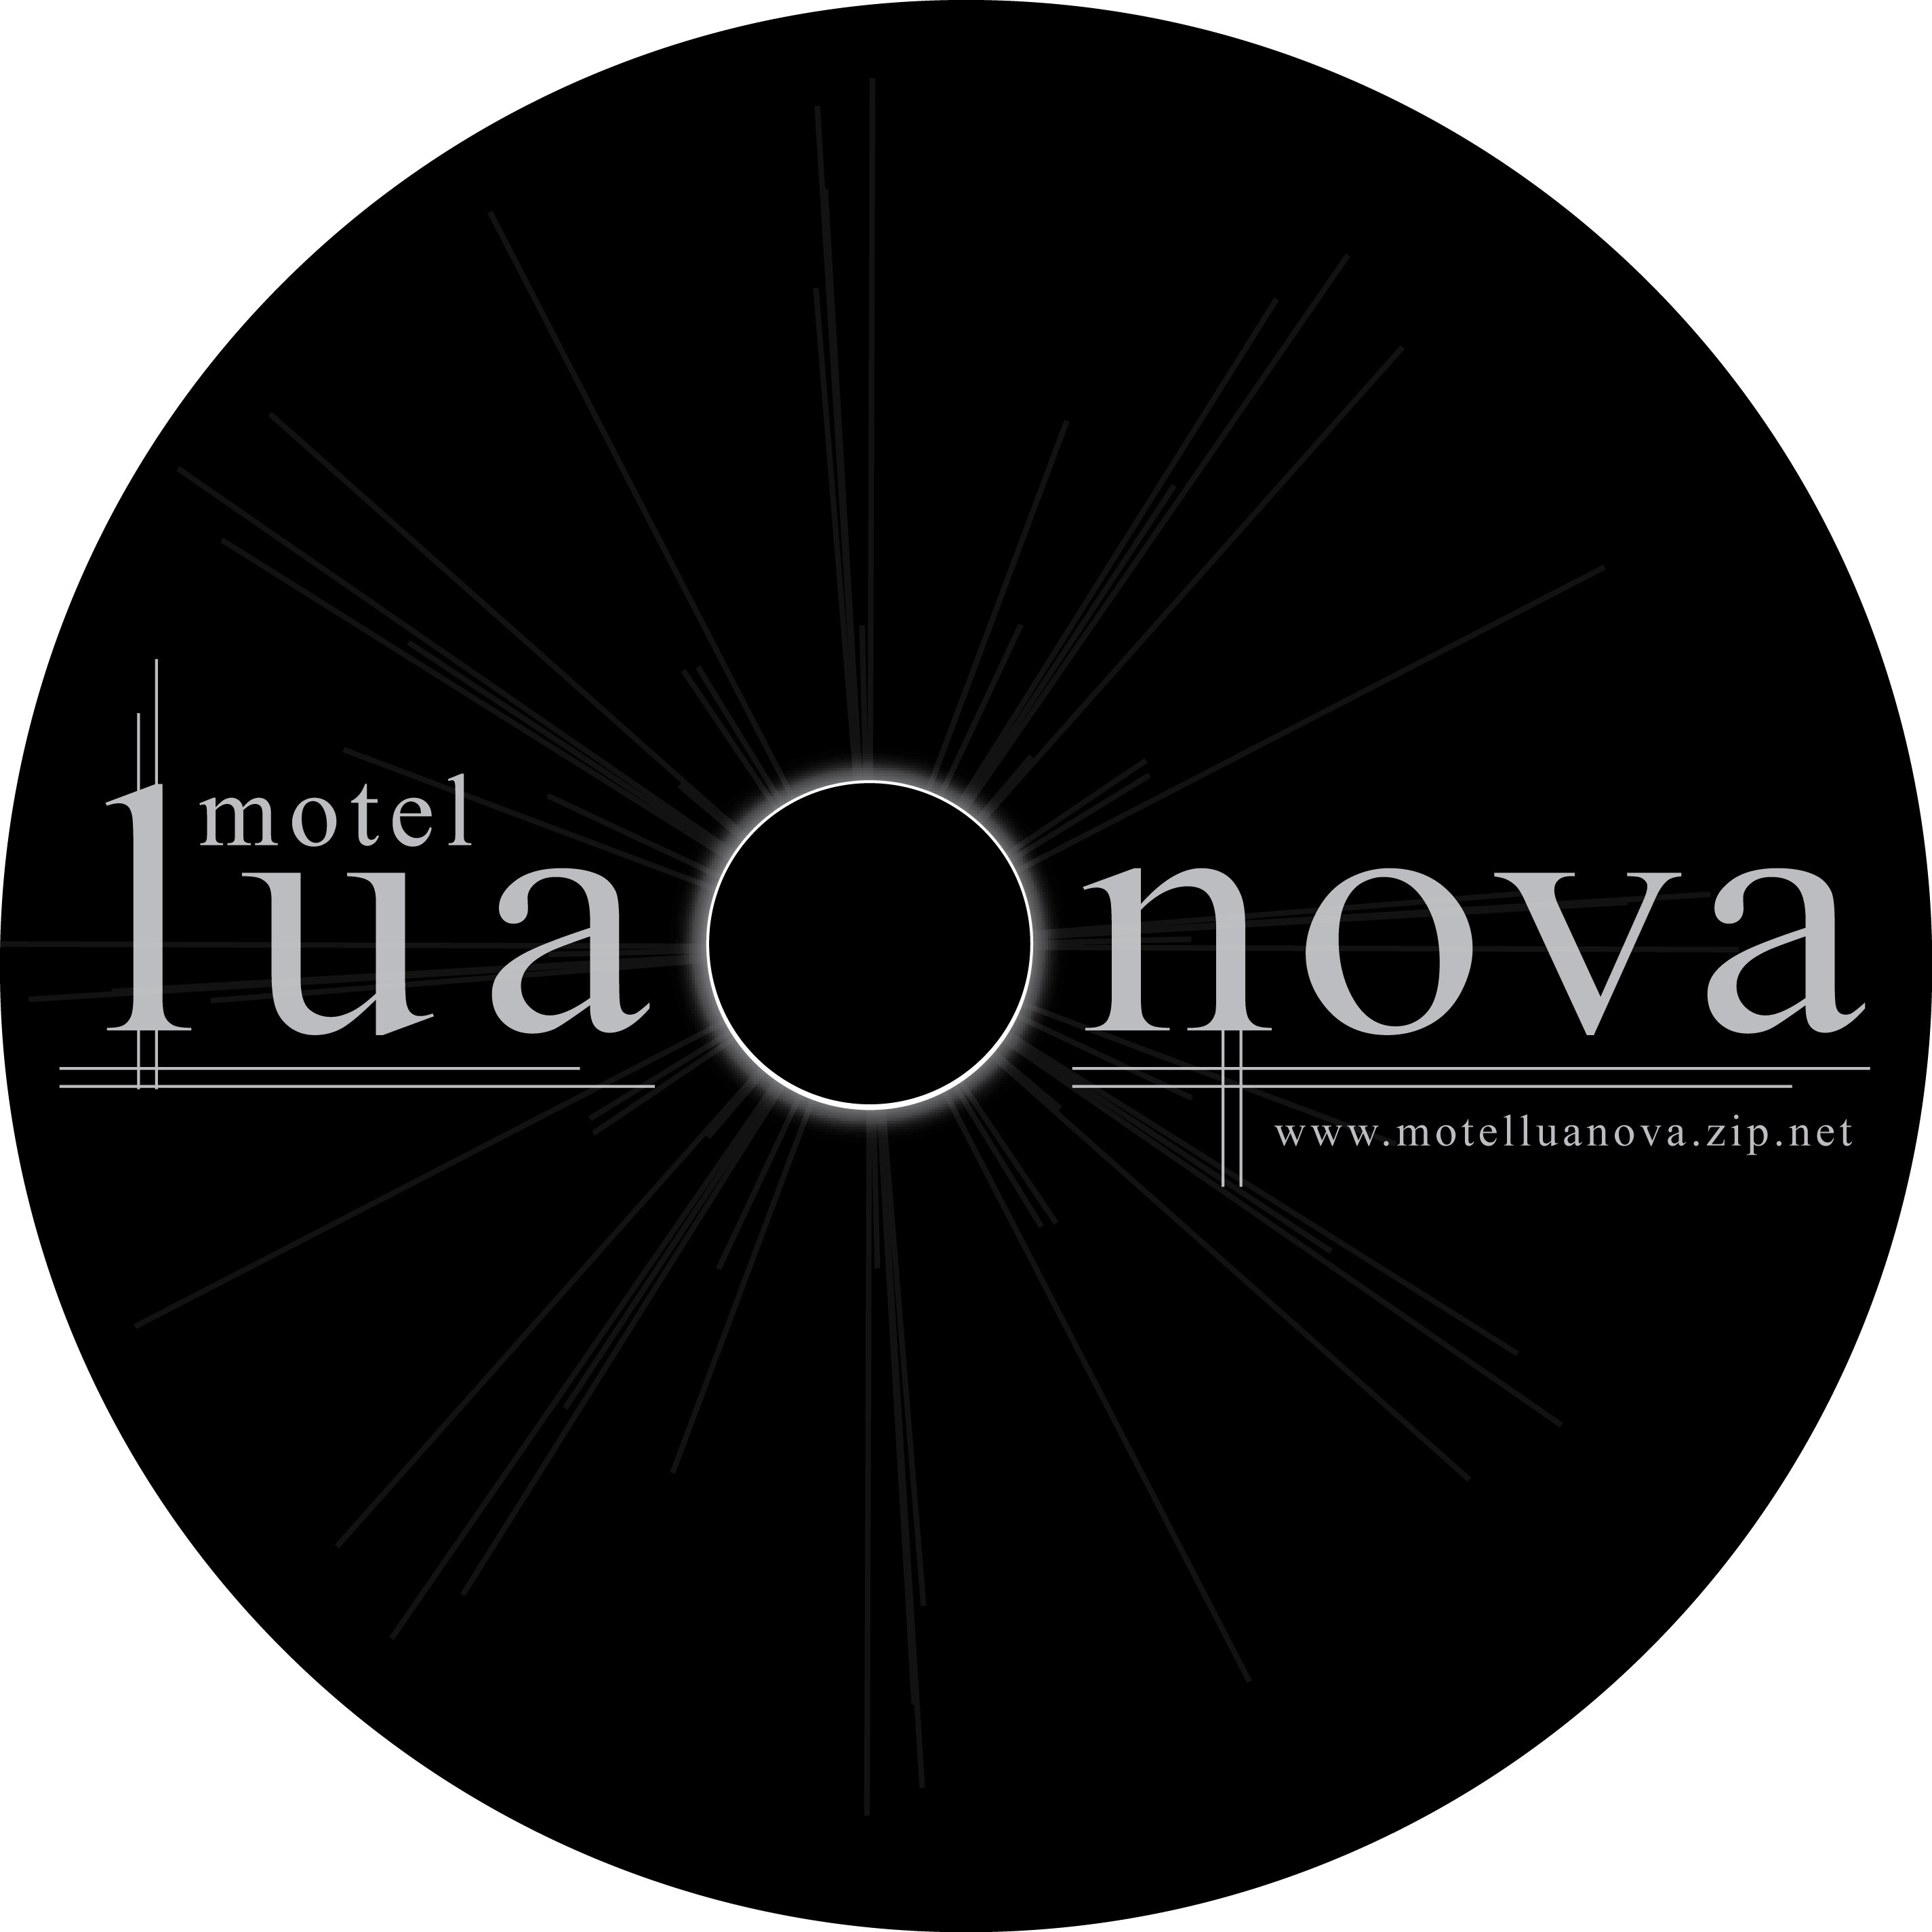 Lua Nova Motel & Hospedagem